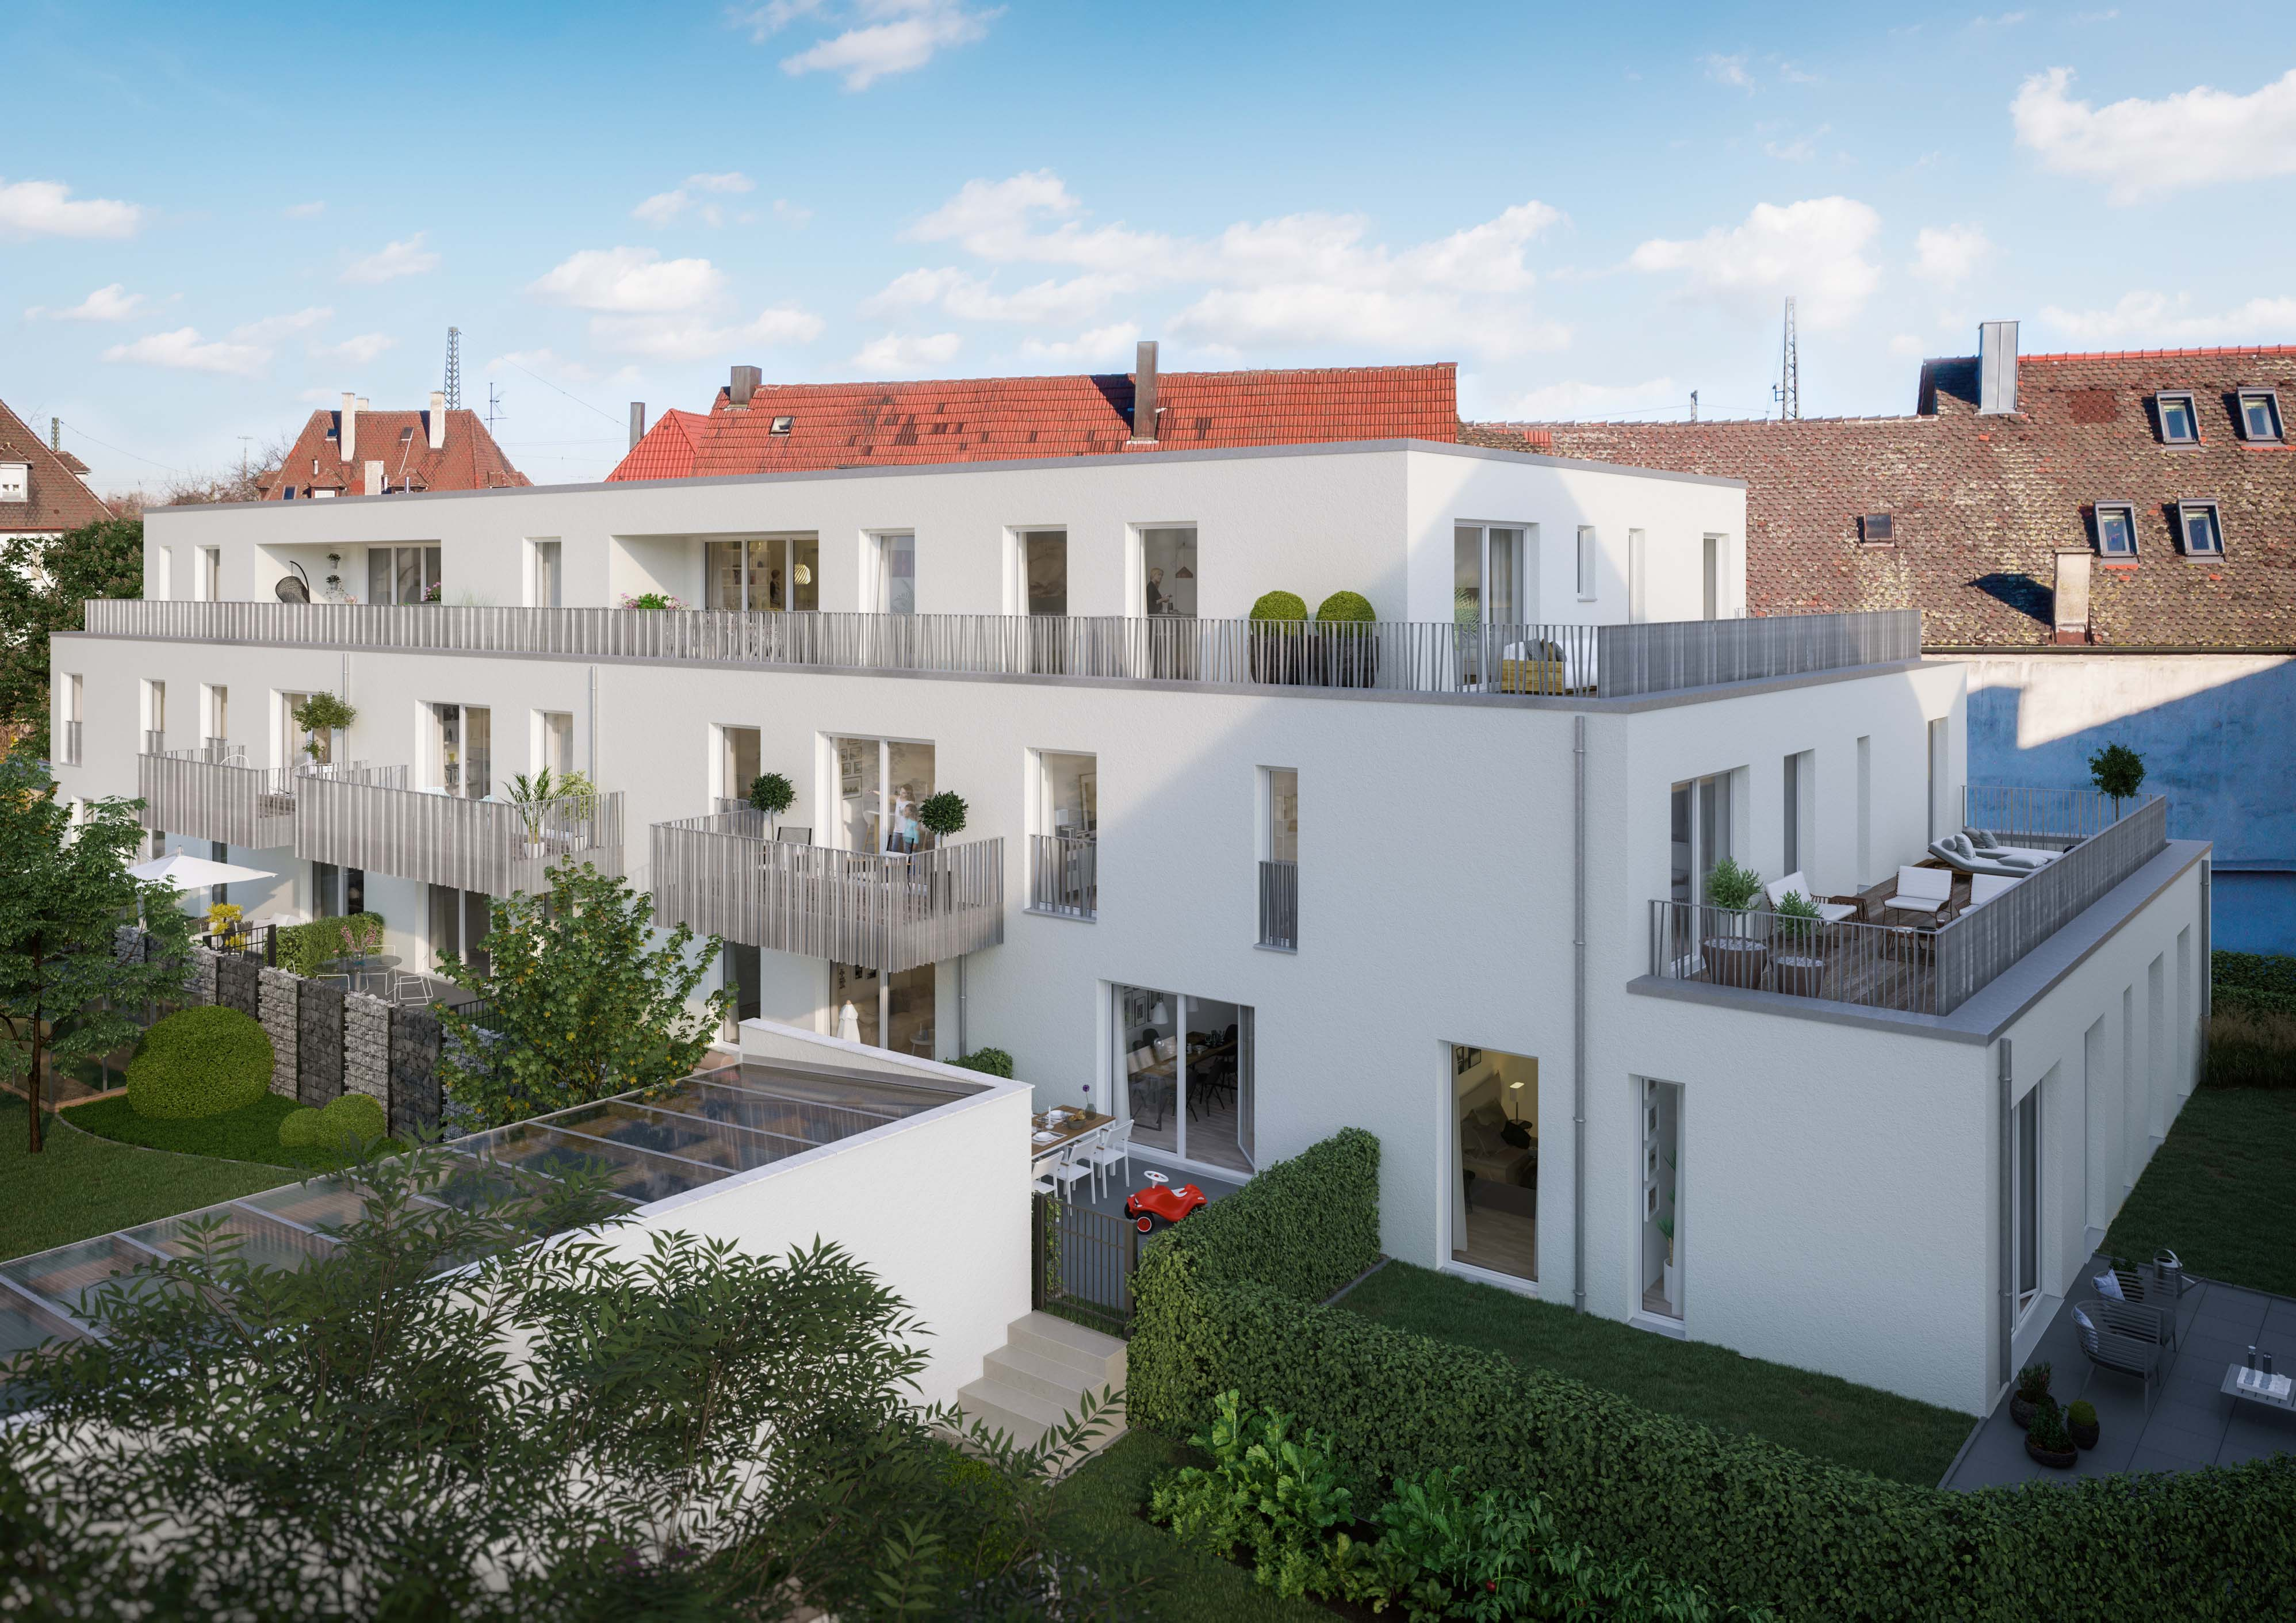 West Stadt Quartier Ludwigsburg